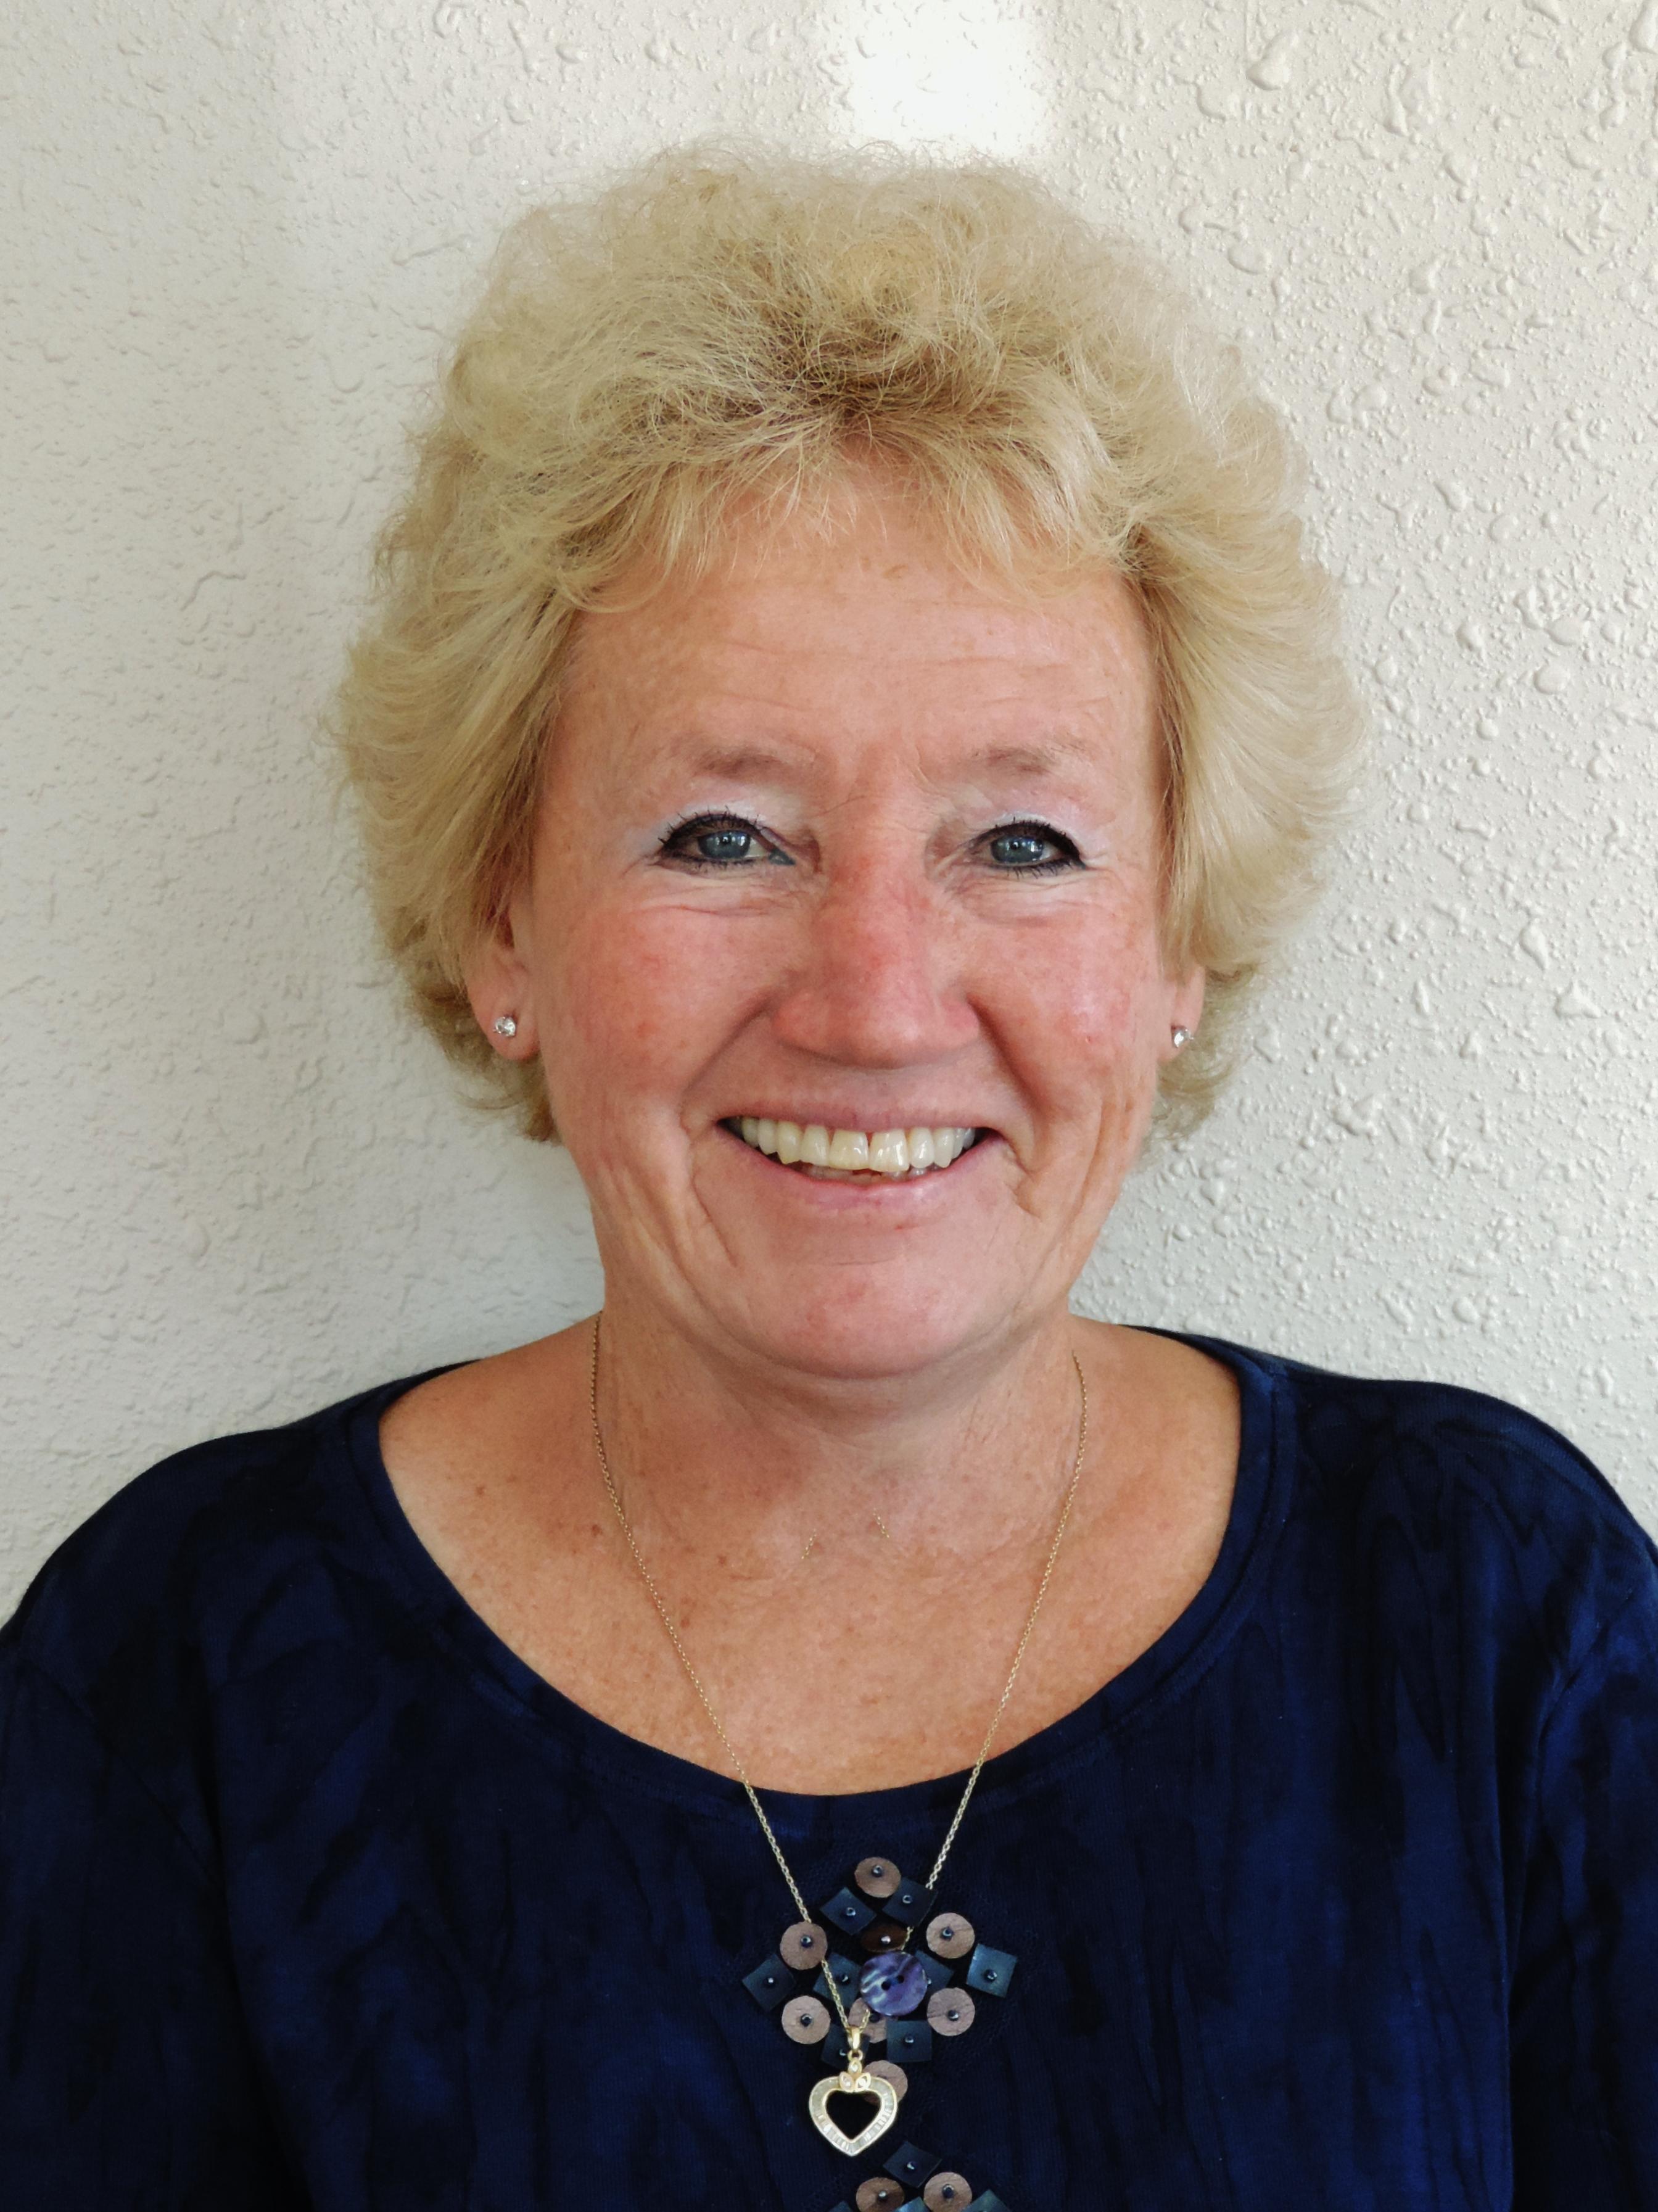 Linda Tilka